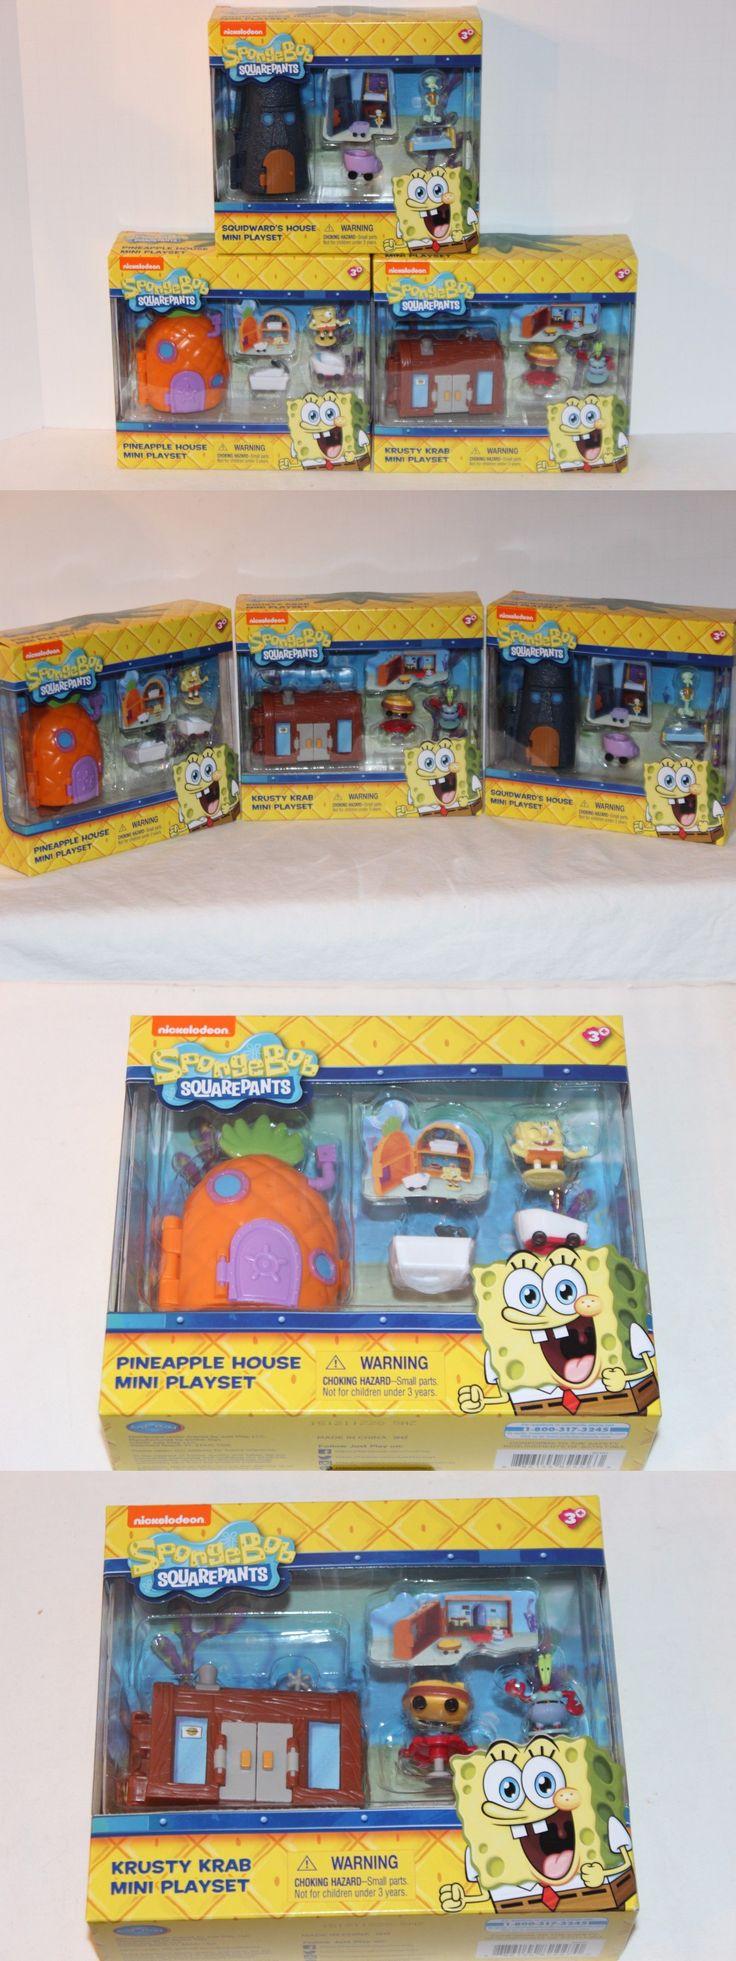 SpongeBob Squarepants 20919: Spongebob Mini Playsets Pineapple And Squidward House Krusty Krab Simba Nib 3+ -> BUY IT NOW ONLY: $47.69 on eBay!